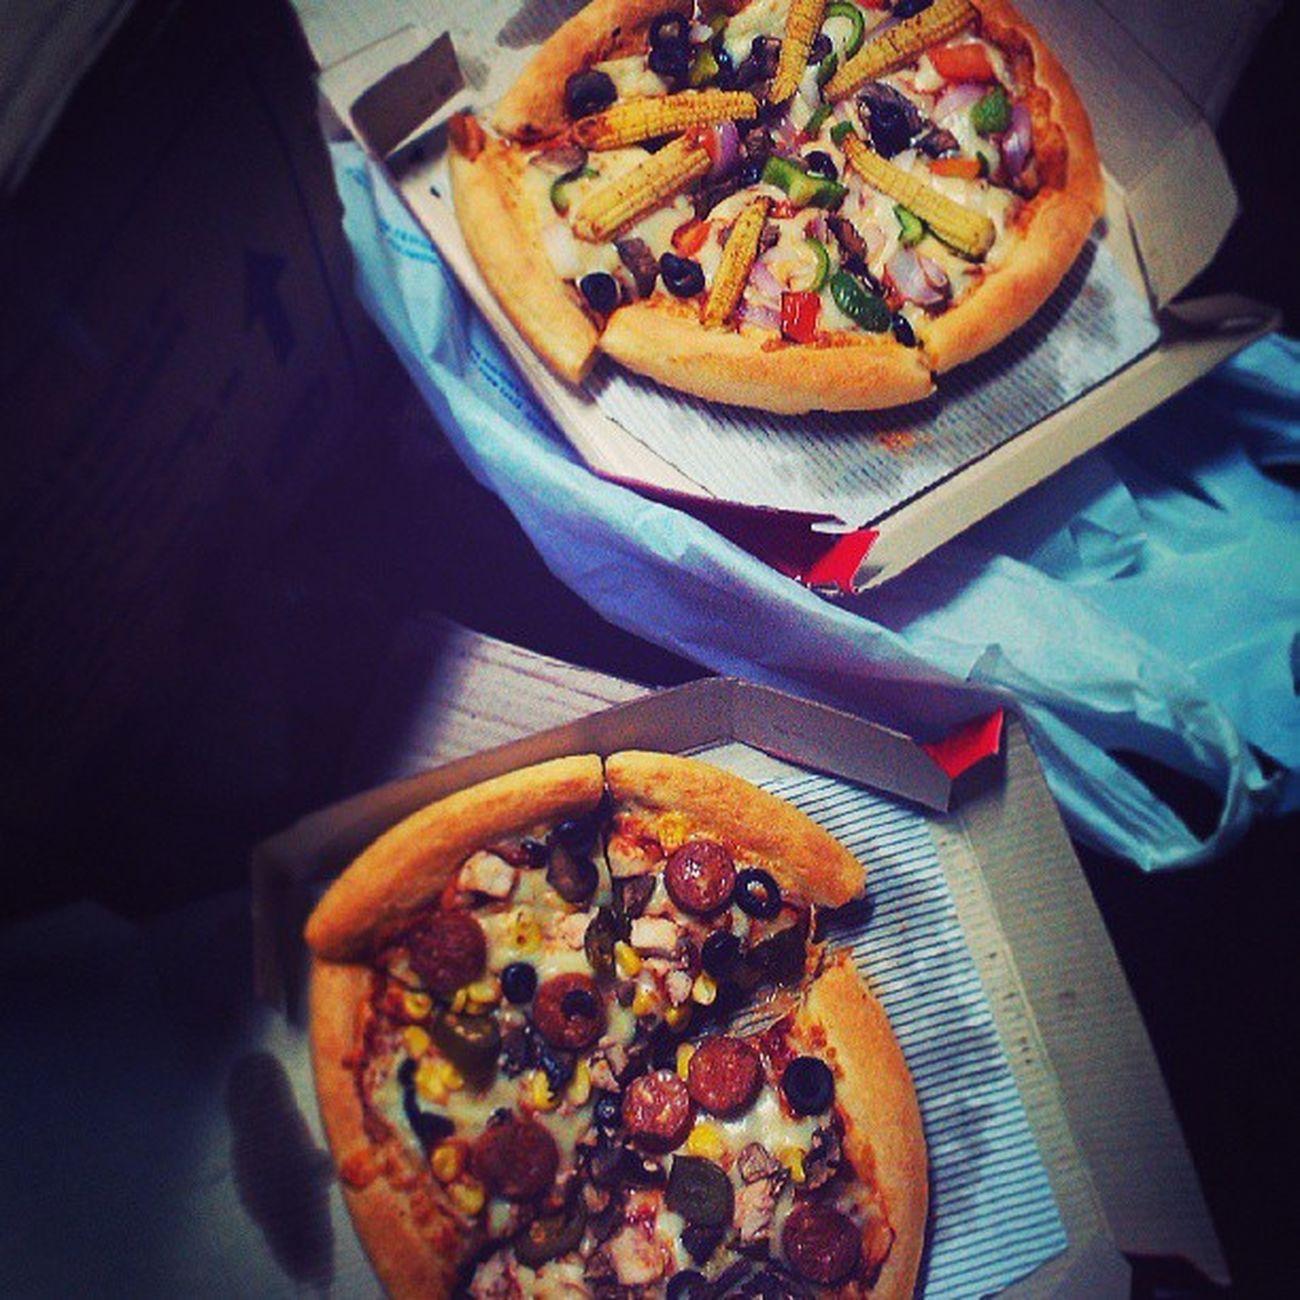 PizzaByTheTrain Pizza Onthestation Yumness Veg nonveg instafood instayum instamumbai mumbai cst goodbyetreat pizzahut parcel chicken veggies bread crazy withfriends awesome